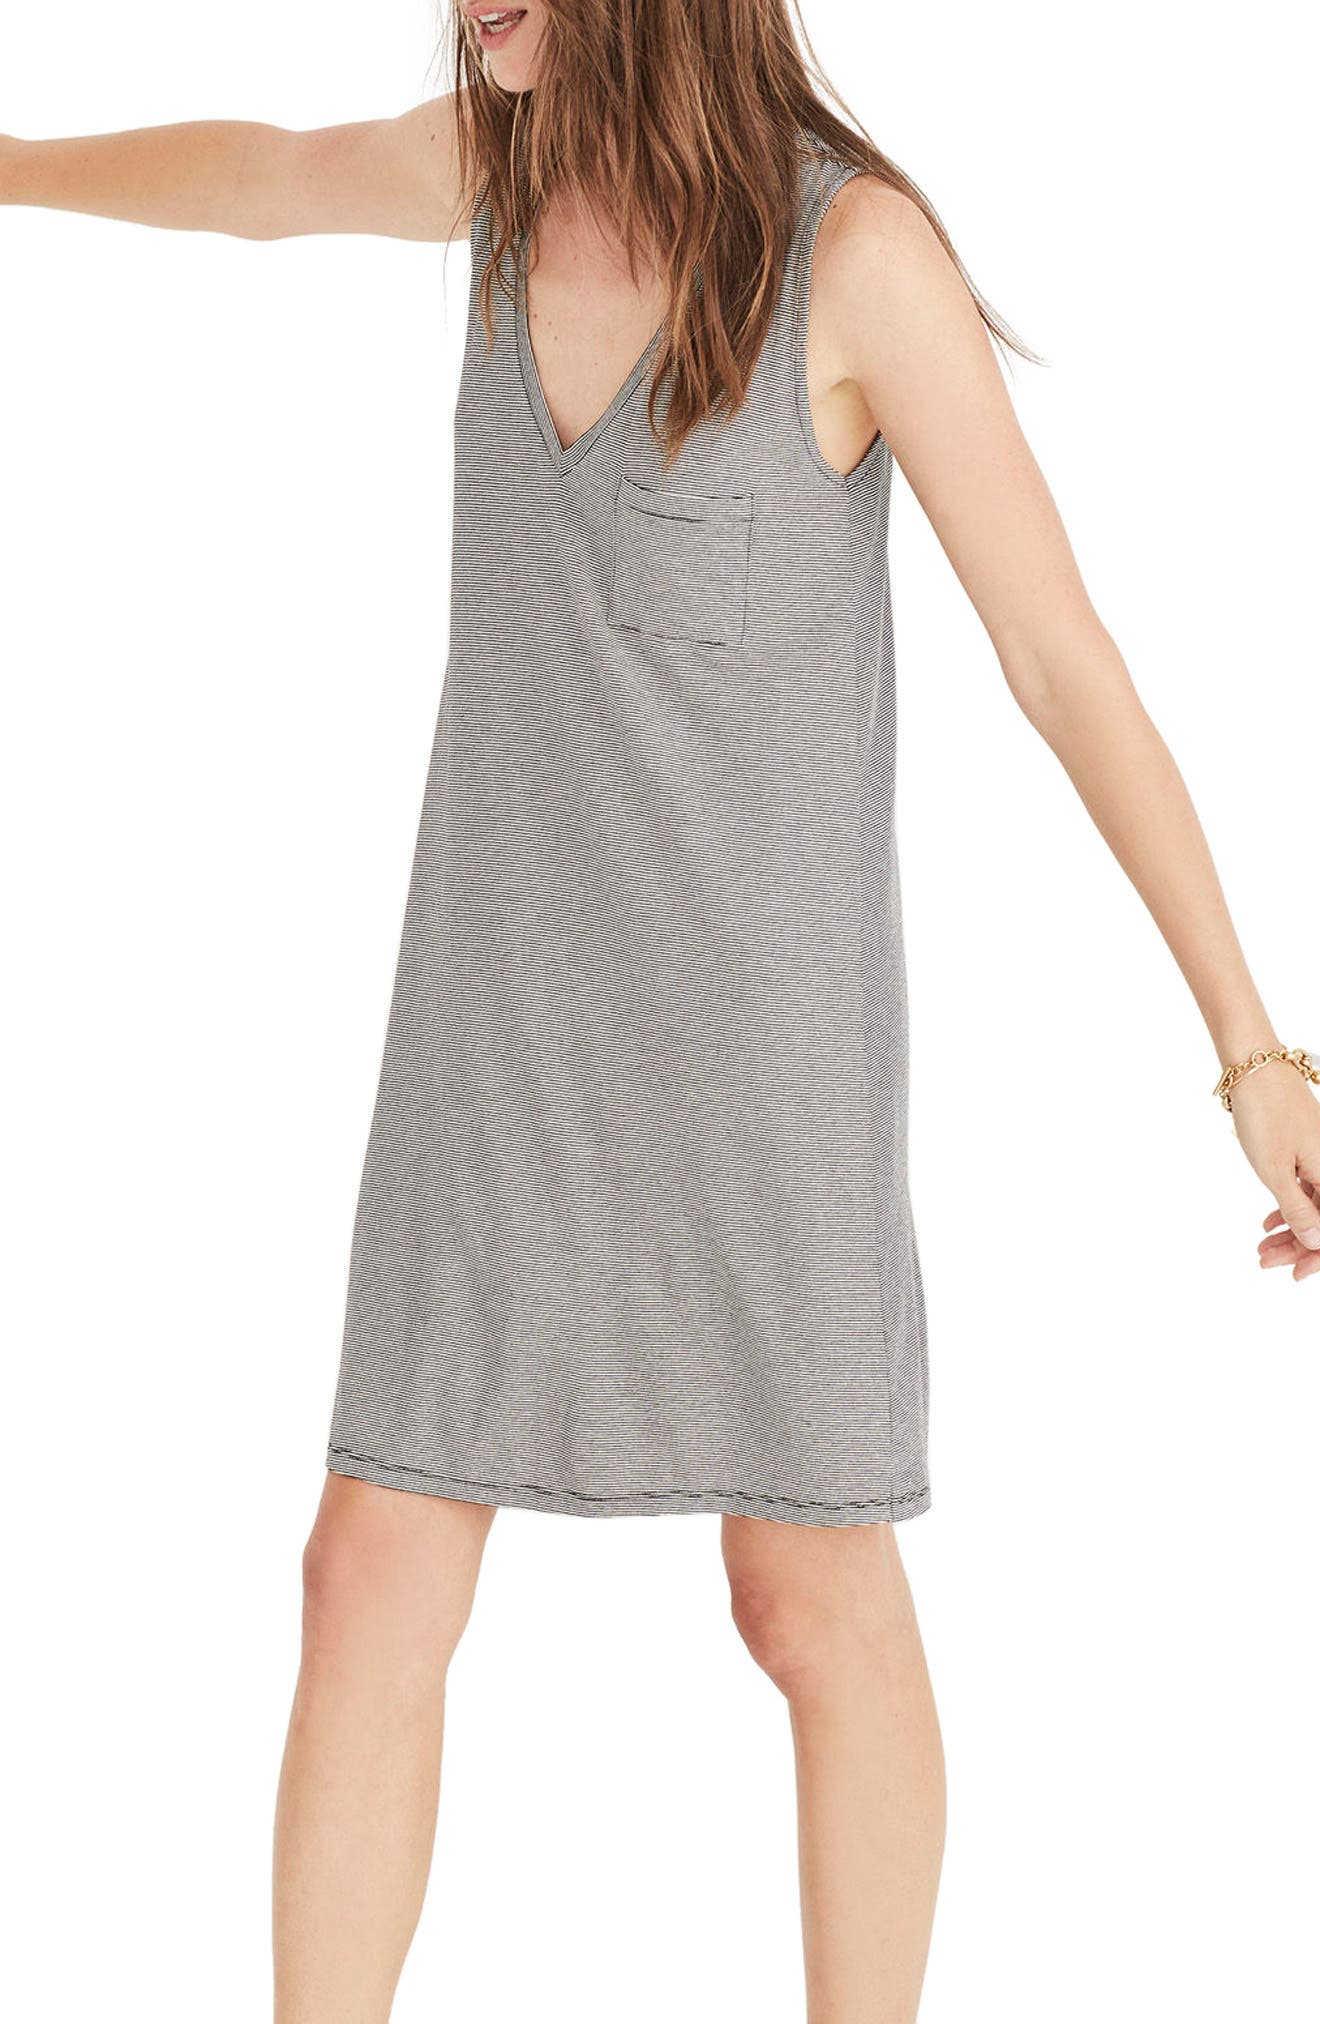 Madewell Stripe Swingy Tank Dress